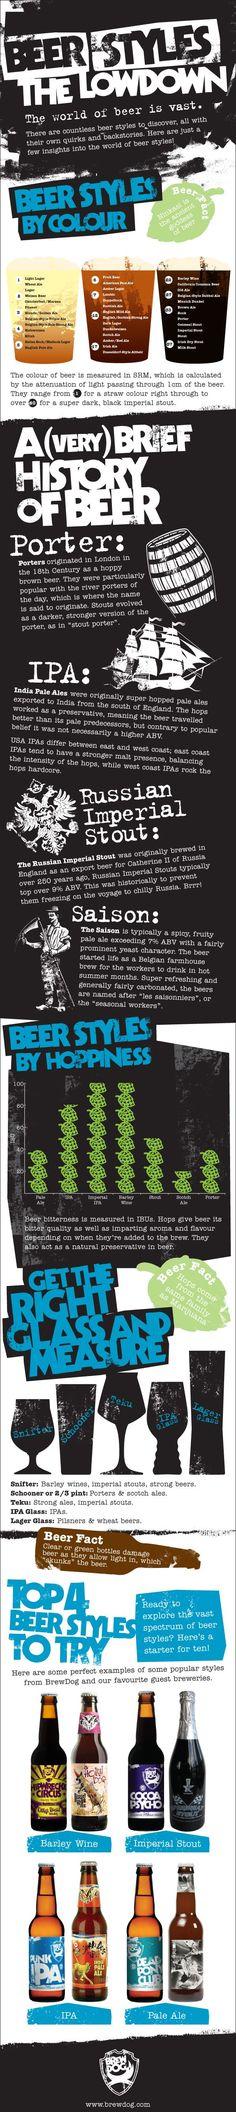 #Craft beer - #beer #styles infographic